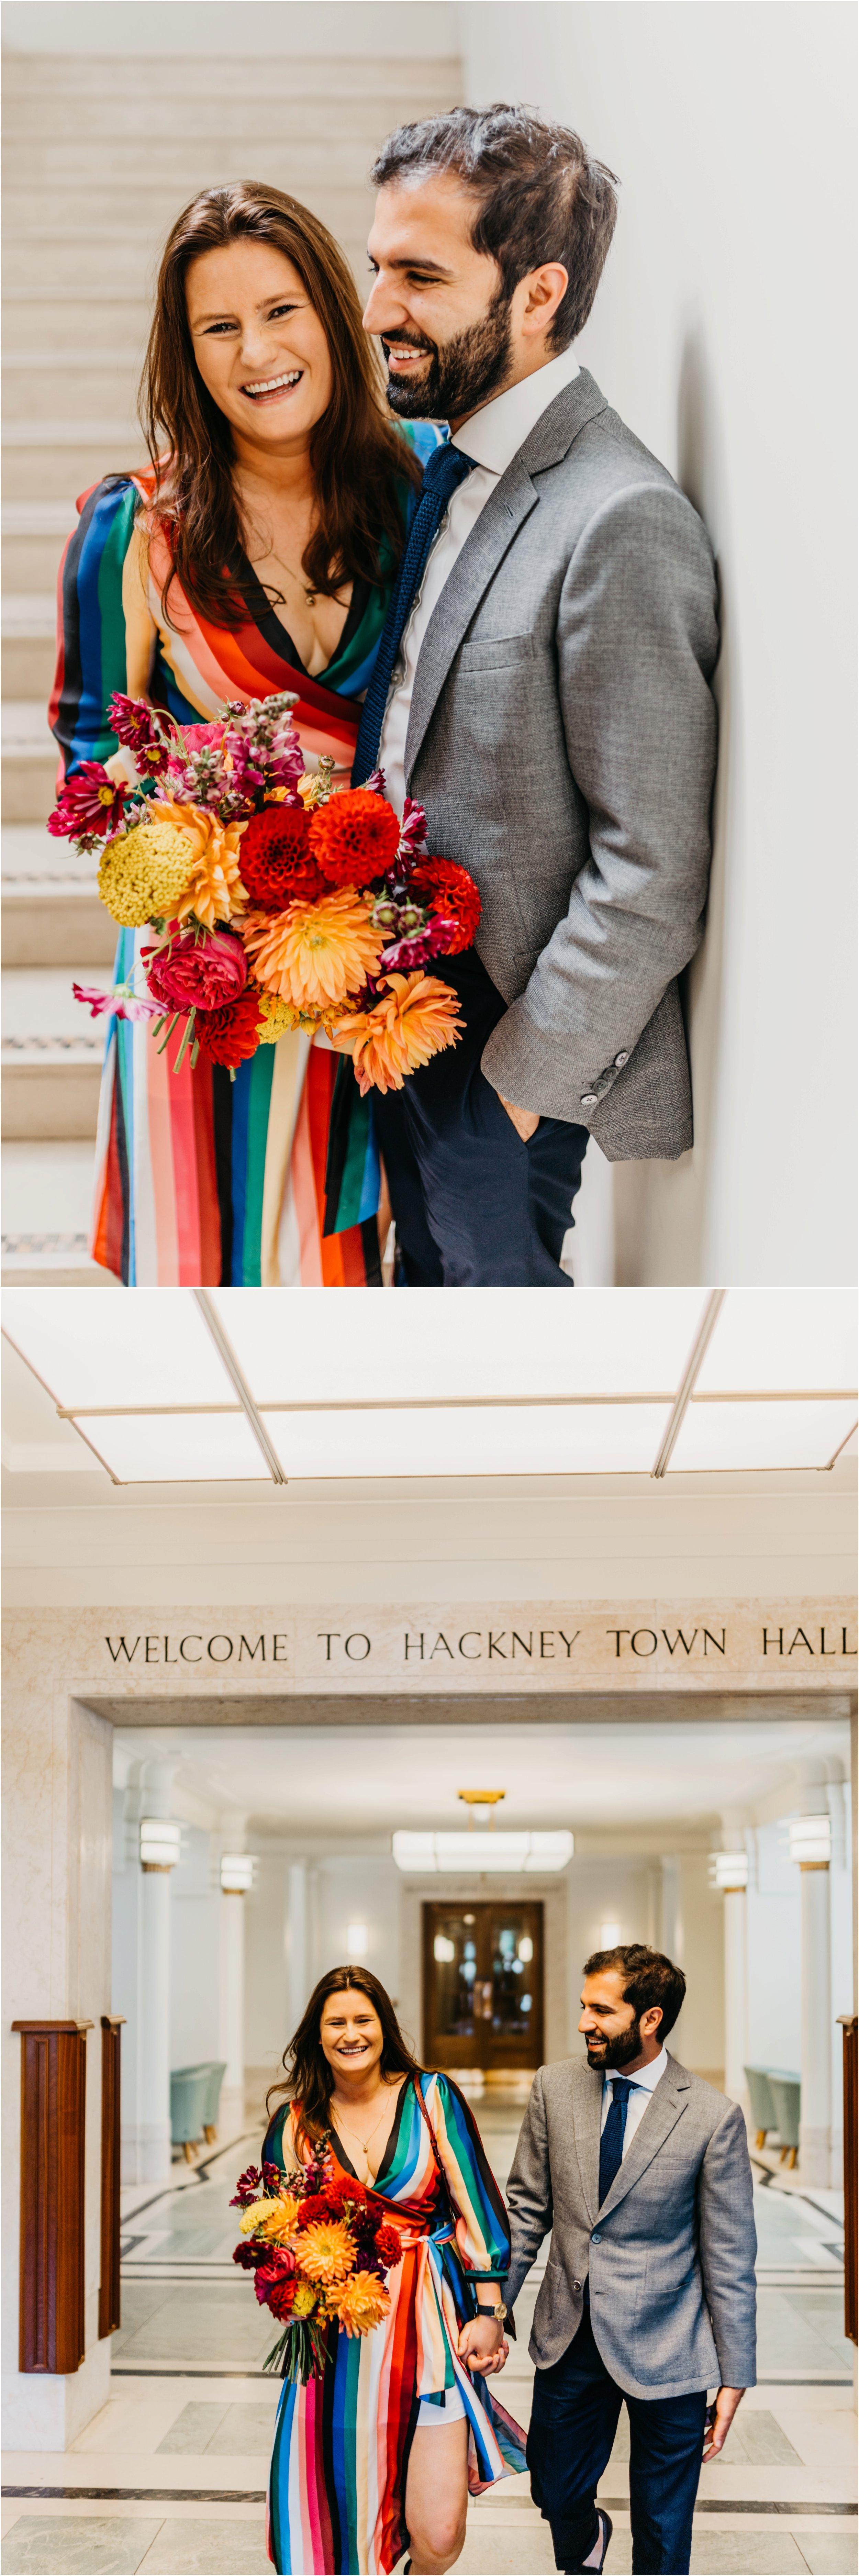 Hackney Town Hall London wedding photographer_0012.jpg